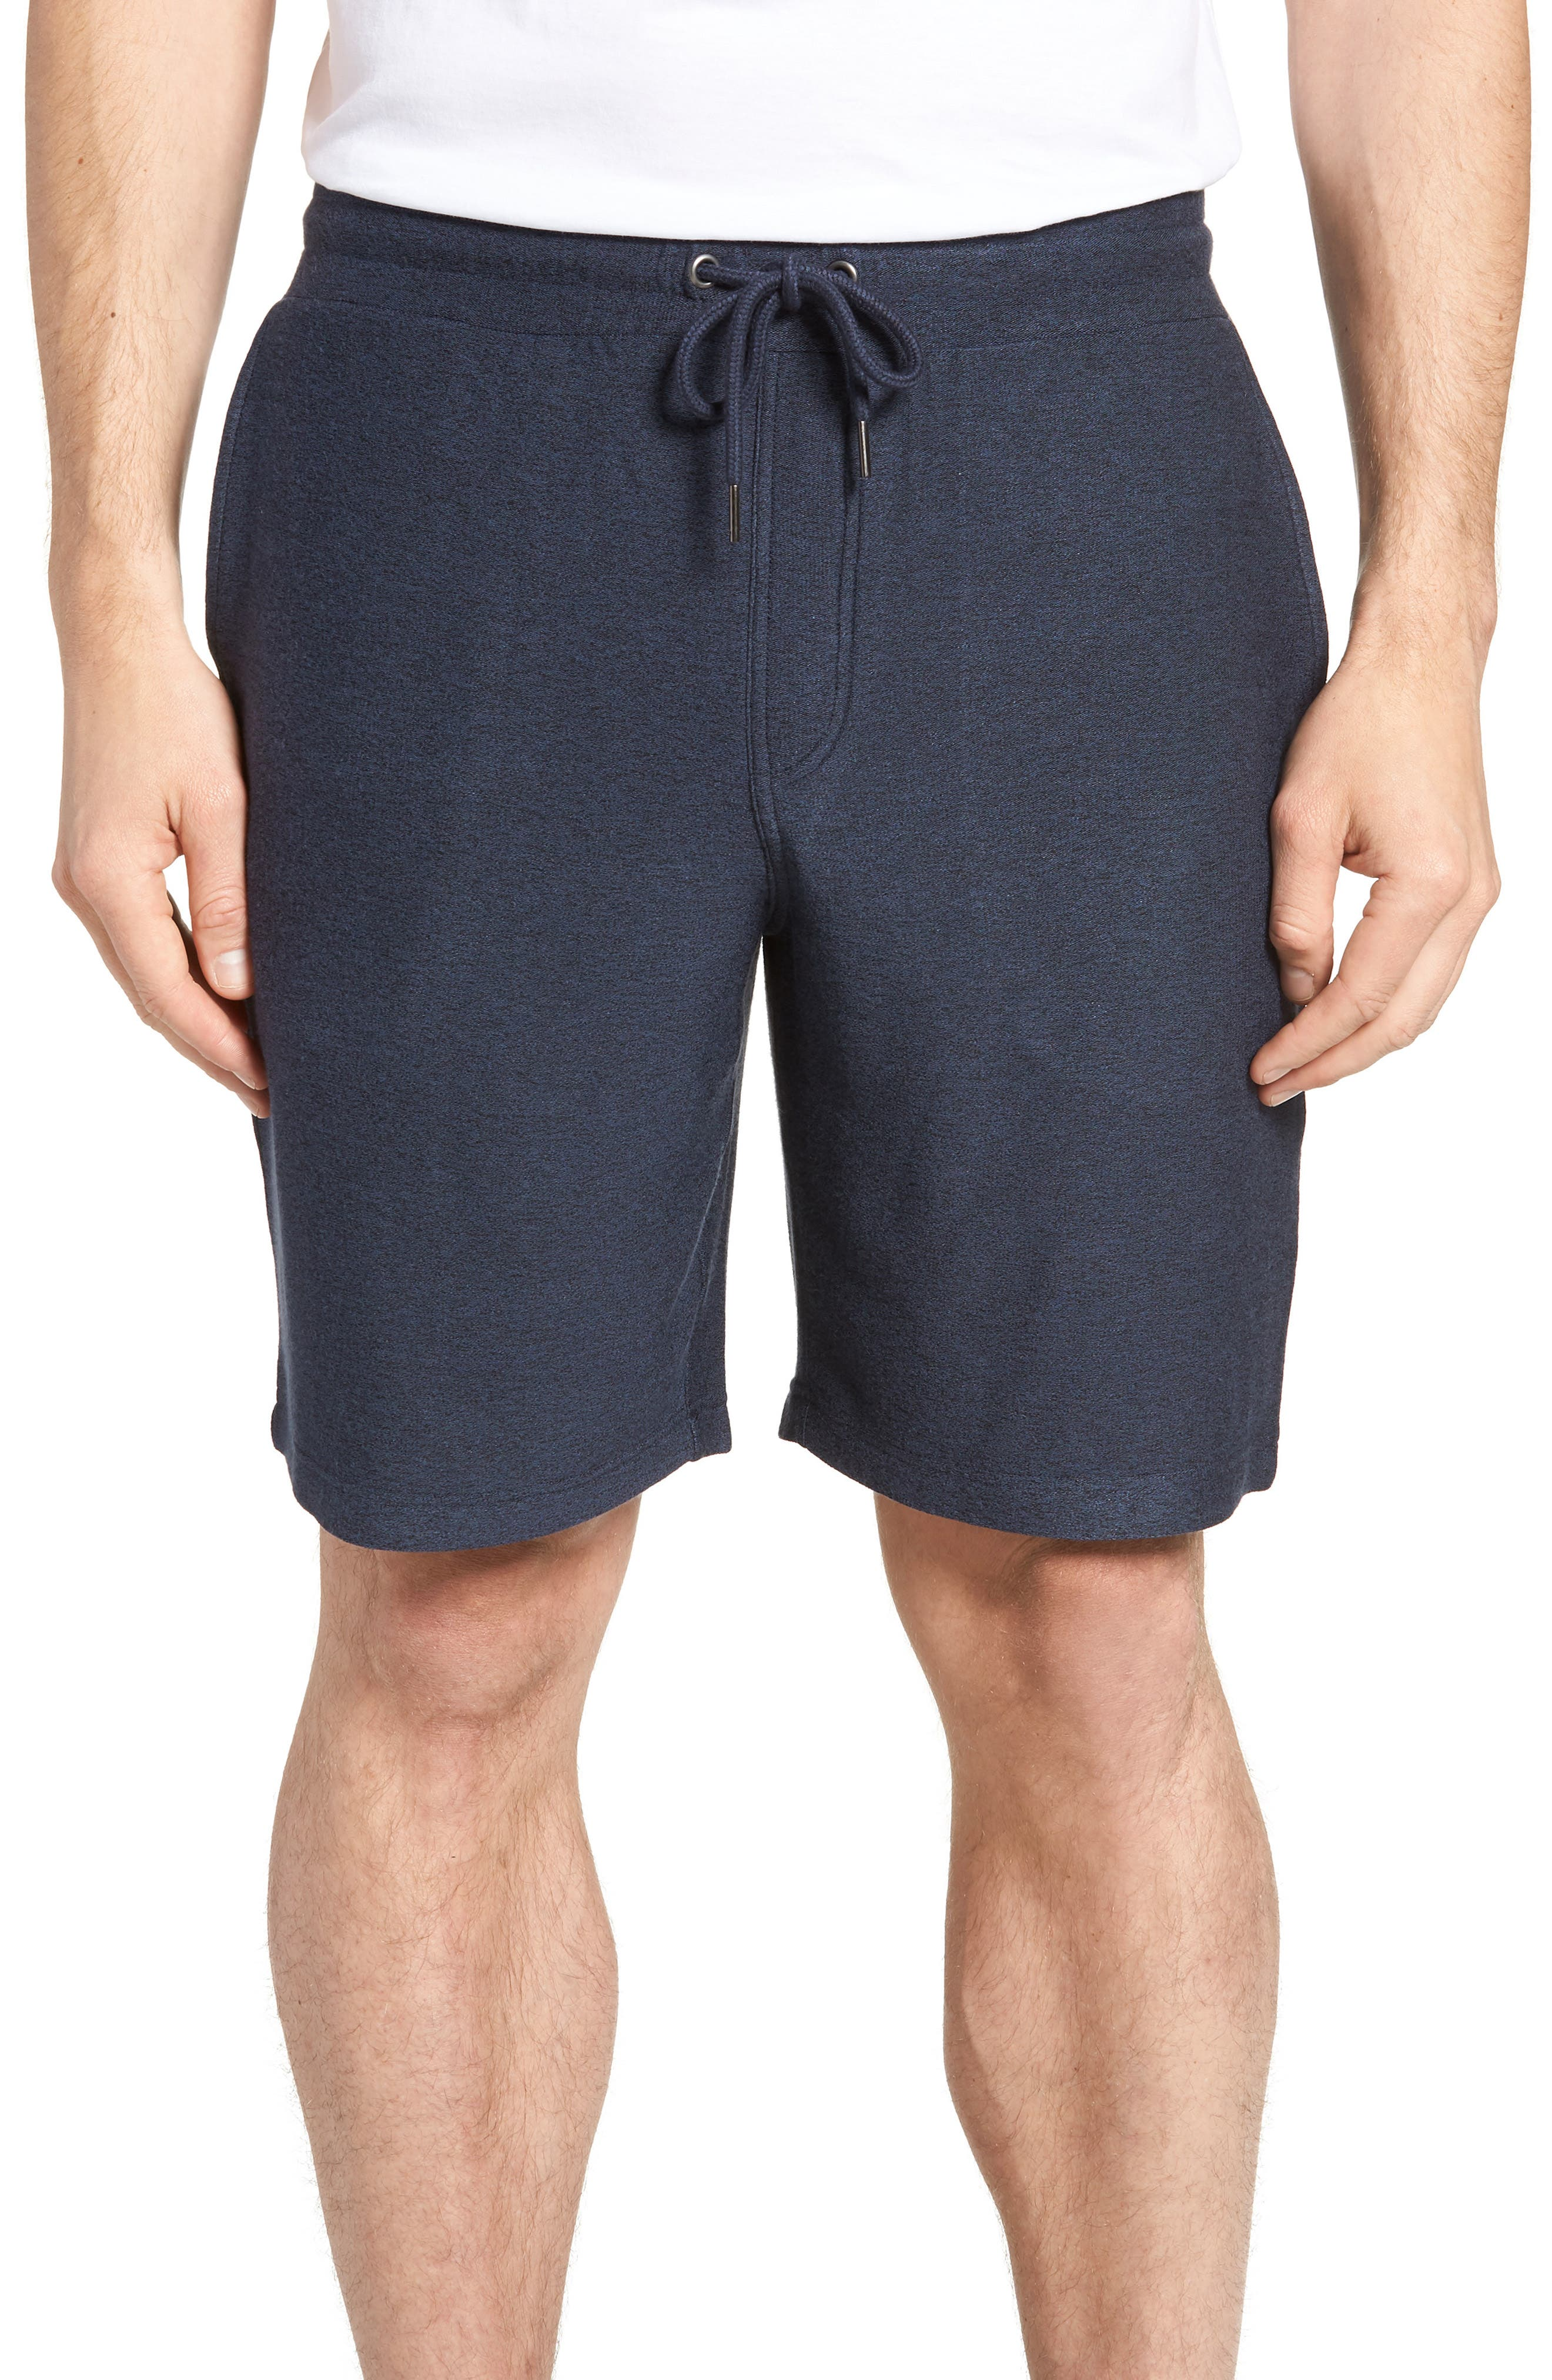 NORDSTROM MEN'S SHOP Lounge Shorts, Main, color, NAVY INDIGO MARL